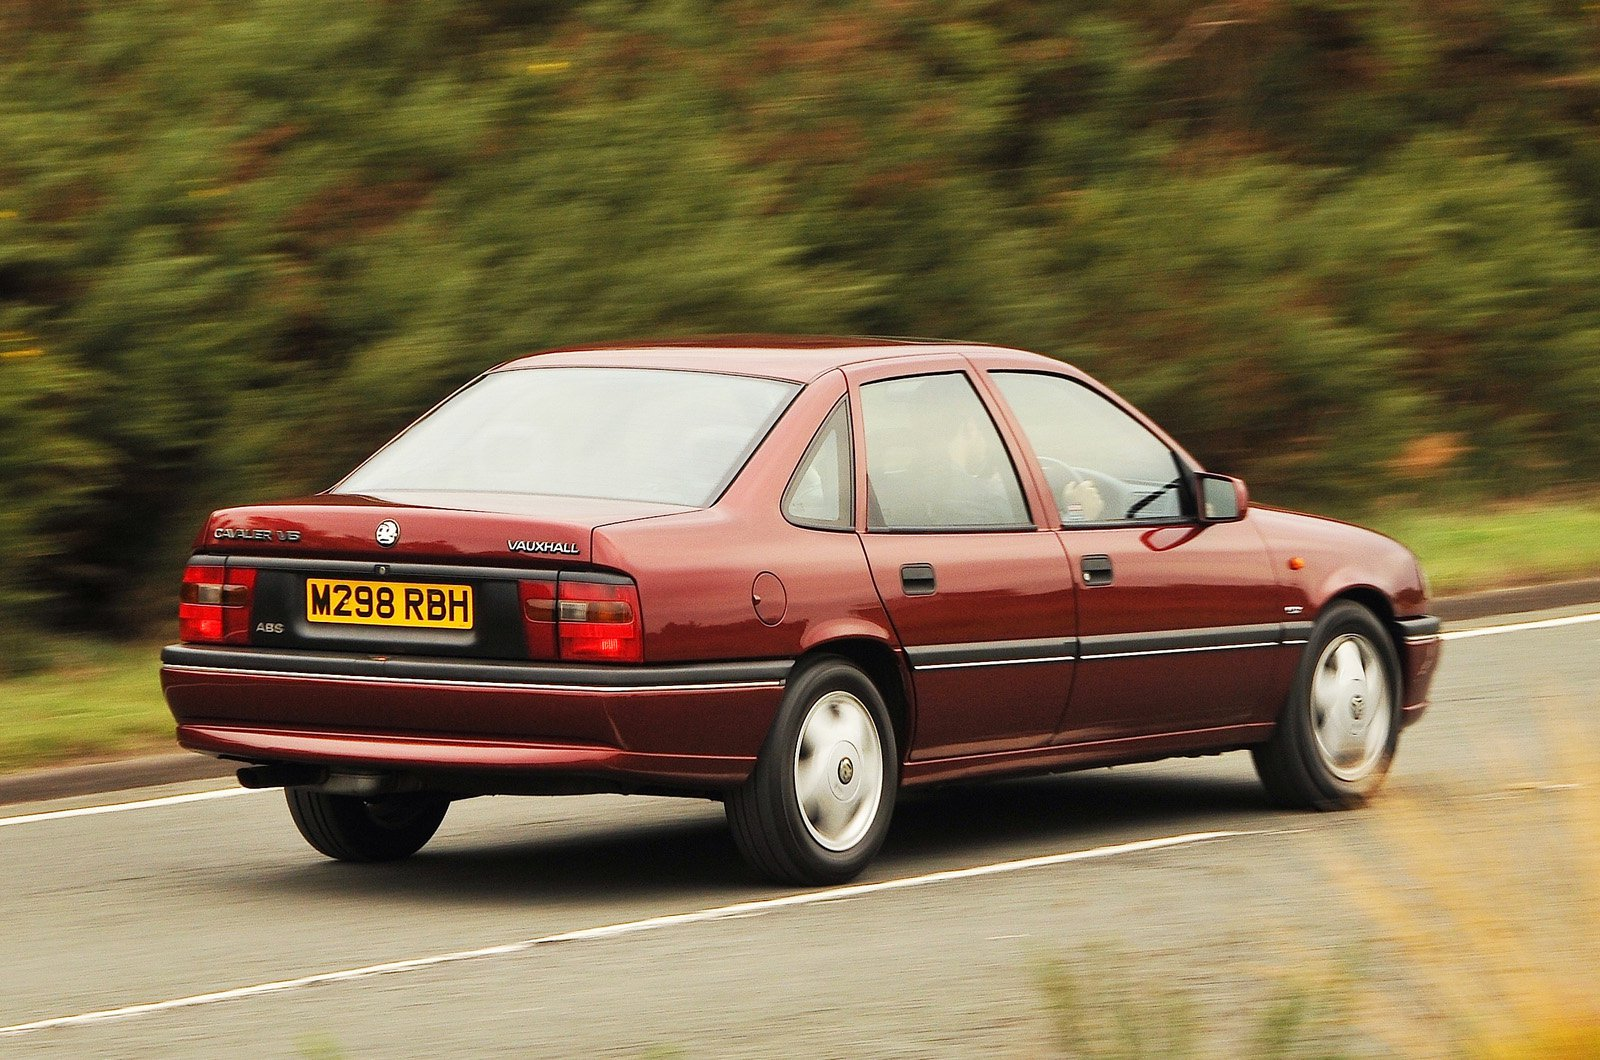 Vauxhall Cavalier Mk3 rear